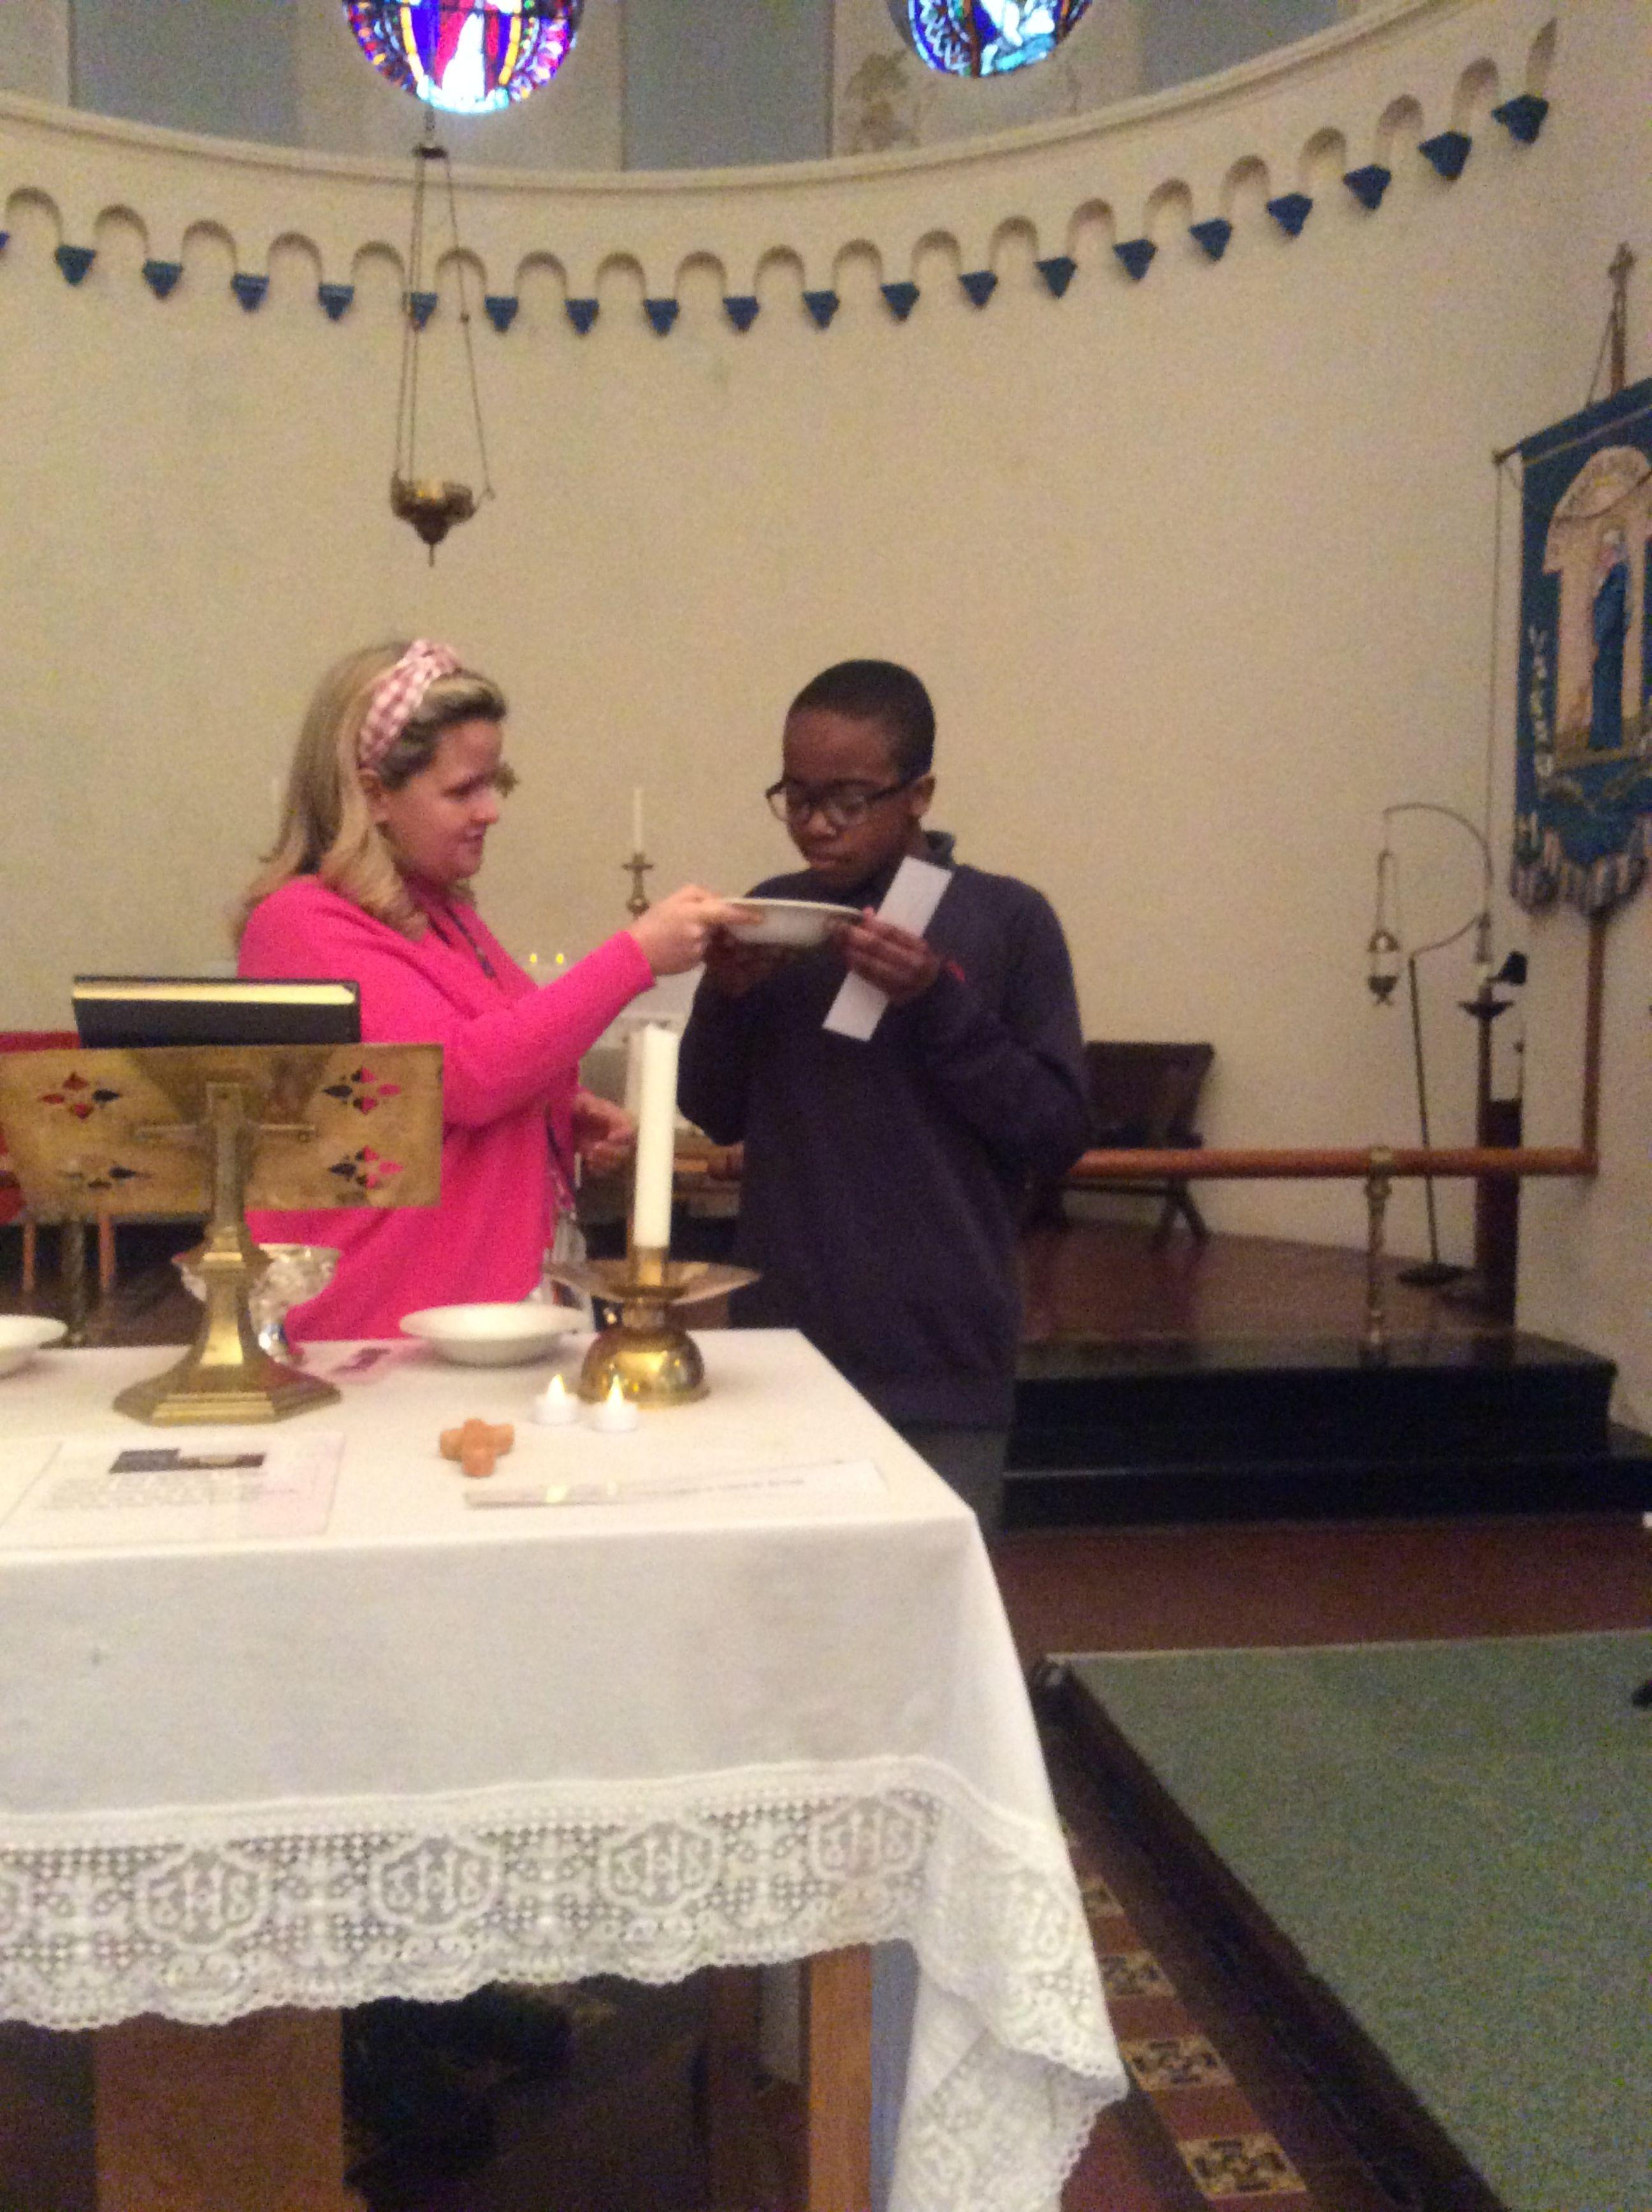 Boy and teacher in church